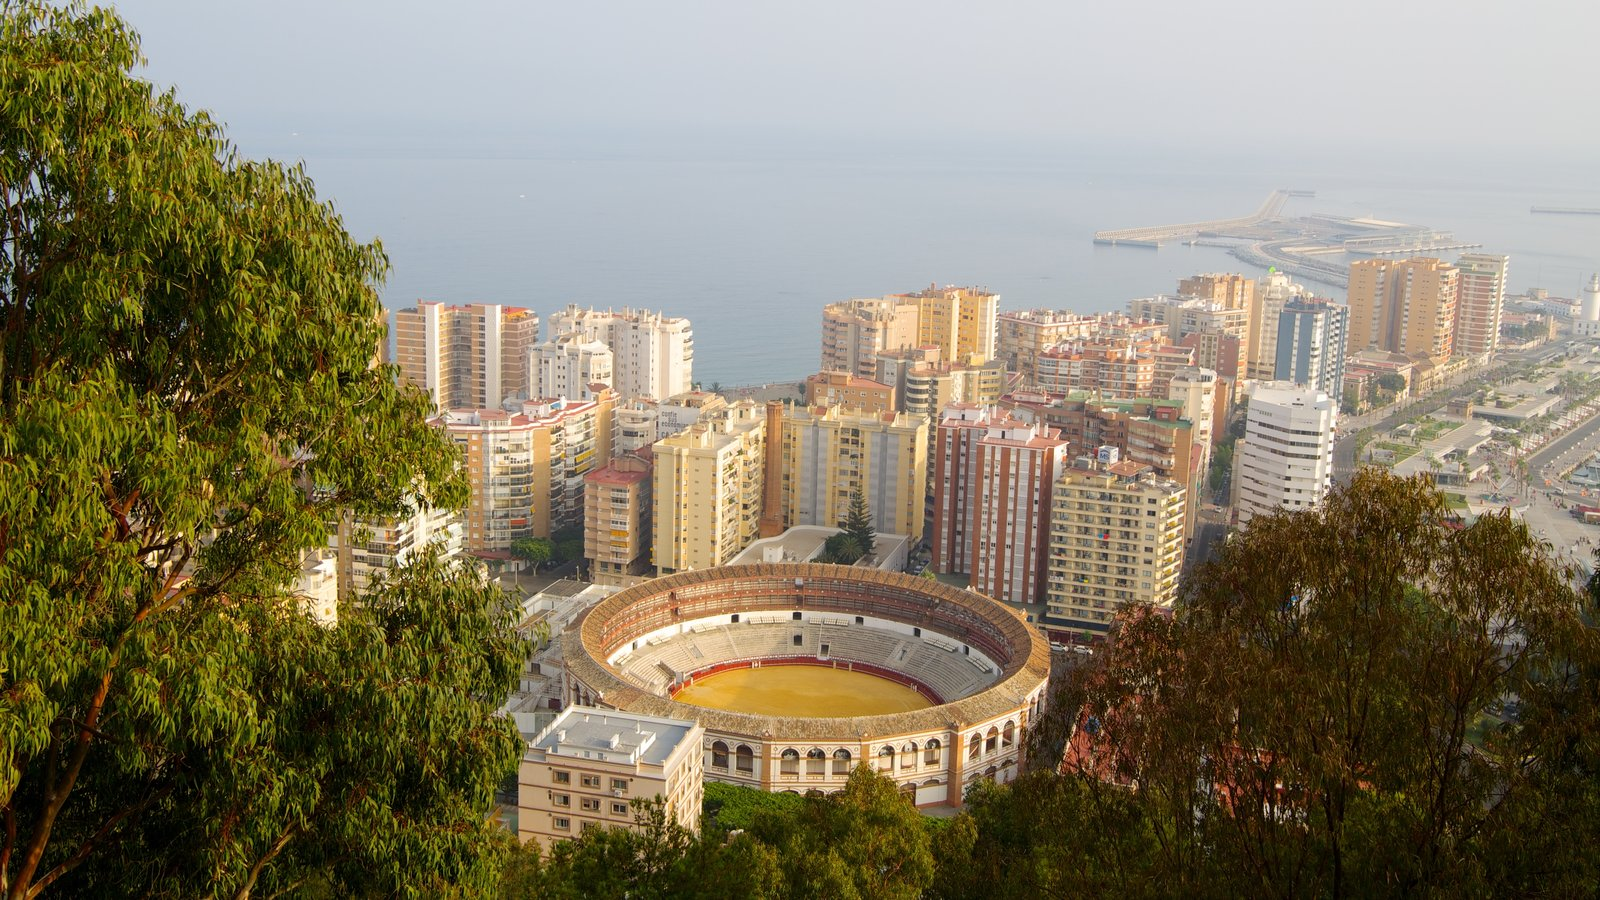 Malaga which includes a city